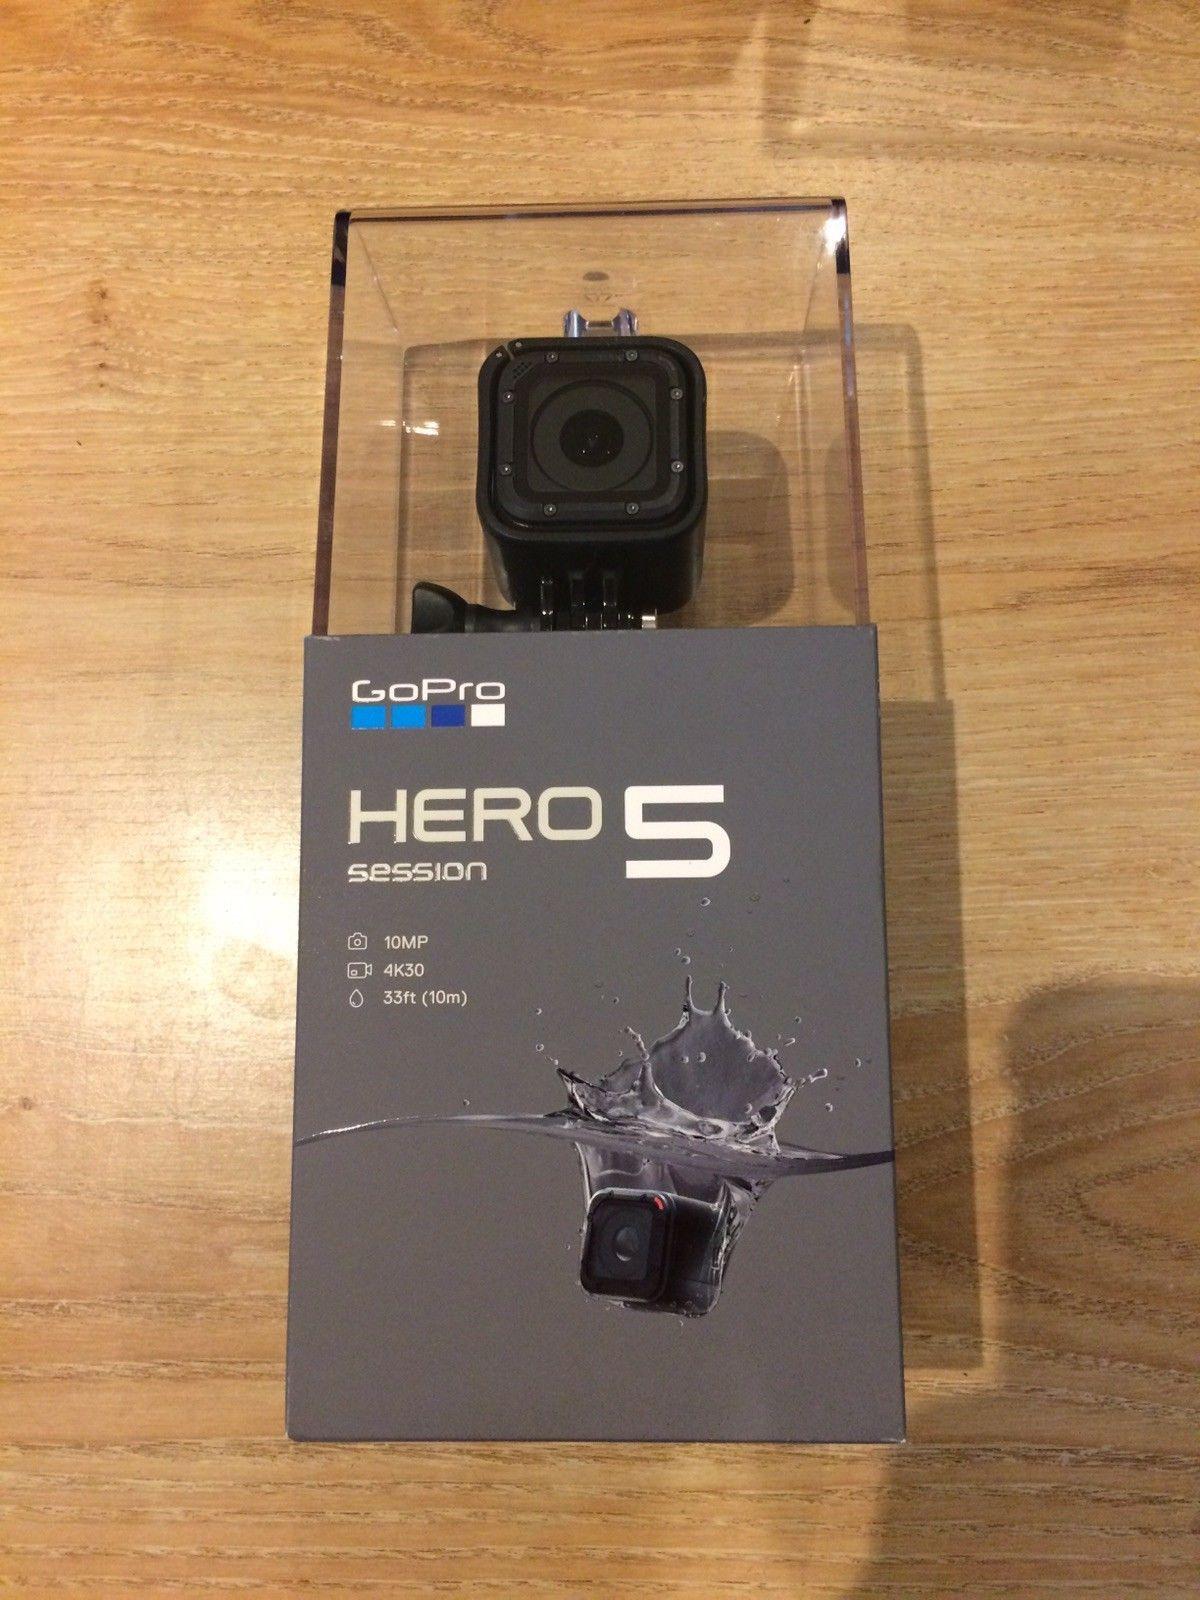 GoPro HERO5 Session Digitised digital camera Black – Pristine and Sealed – 4K Video – Water-proof